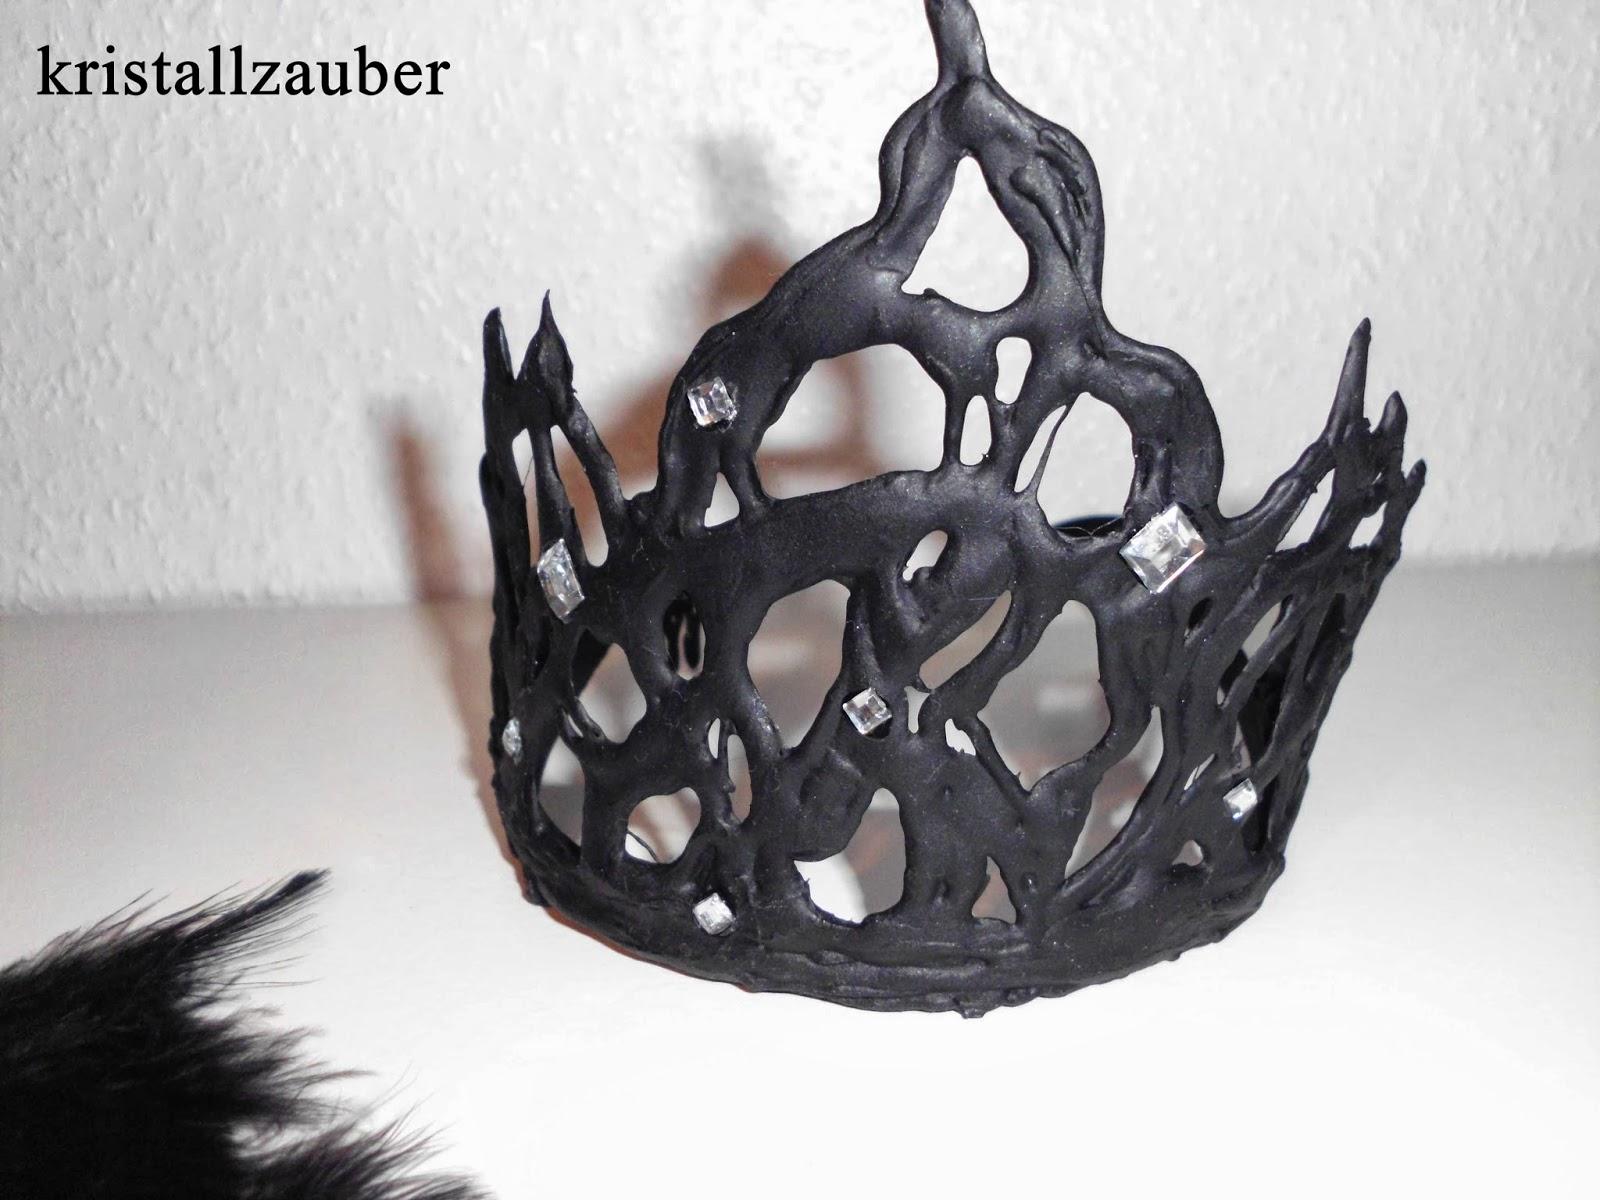 Kristallzauber: {DIY} Böse Königin/ Black Swan - Krone